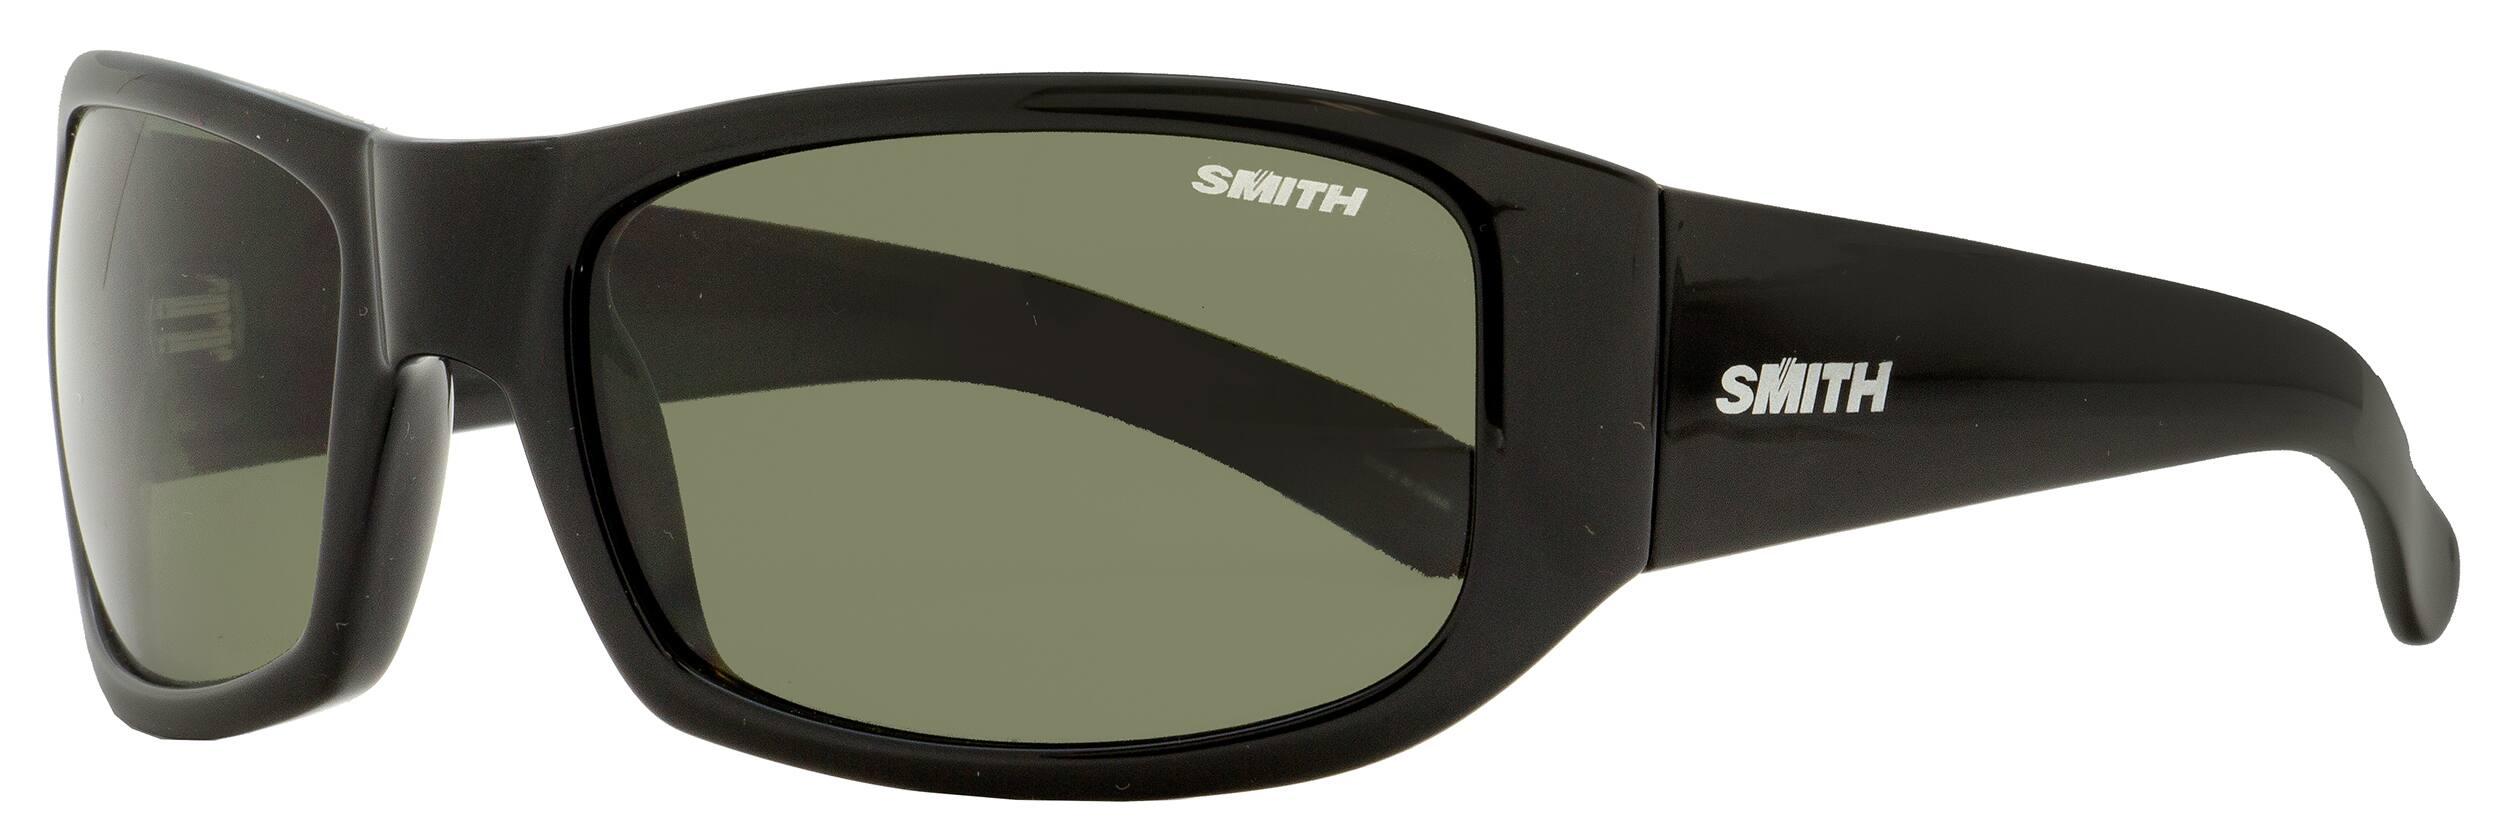 Smith Optics Sunglasses (including Polarized) from $41.40 + Free Shipping